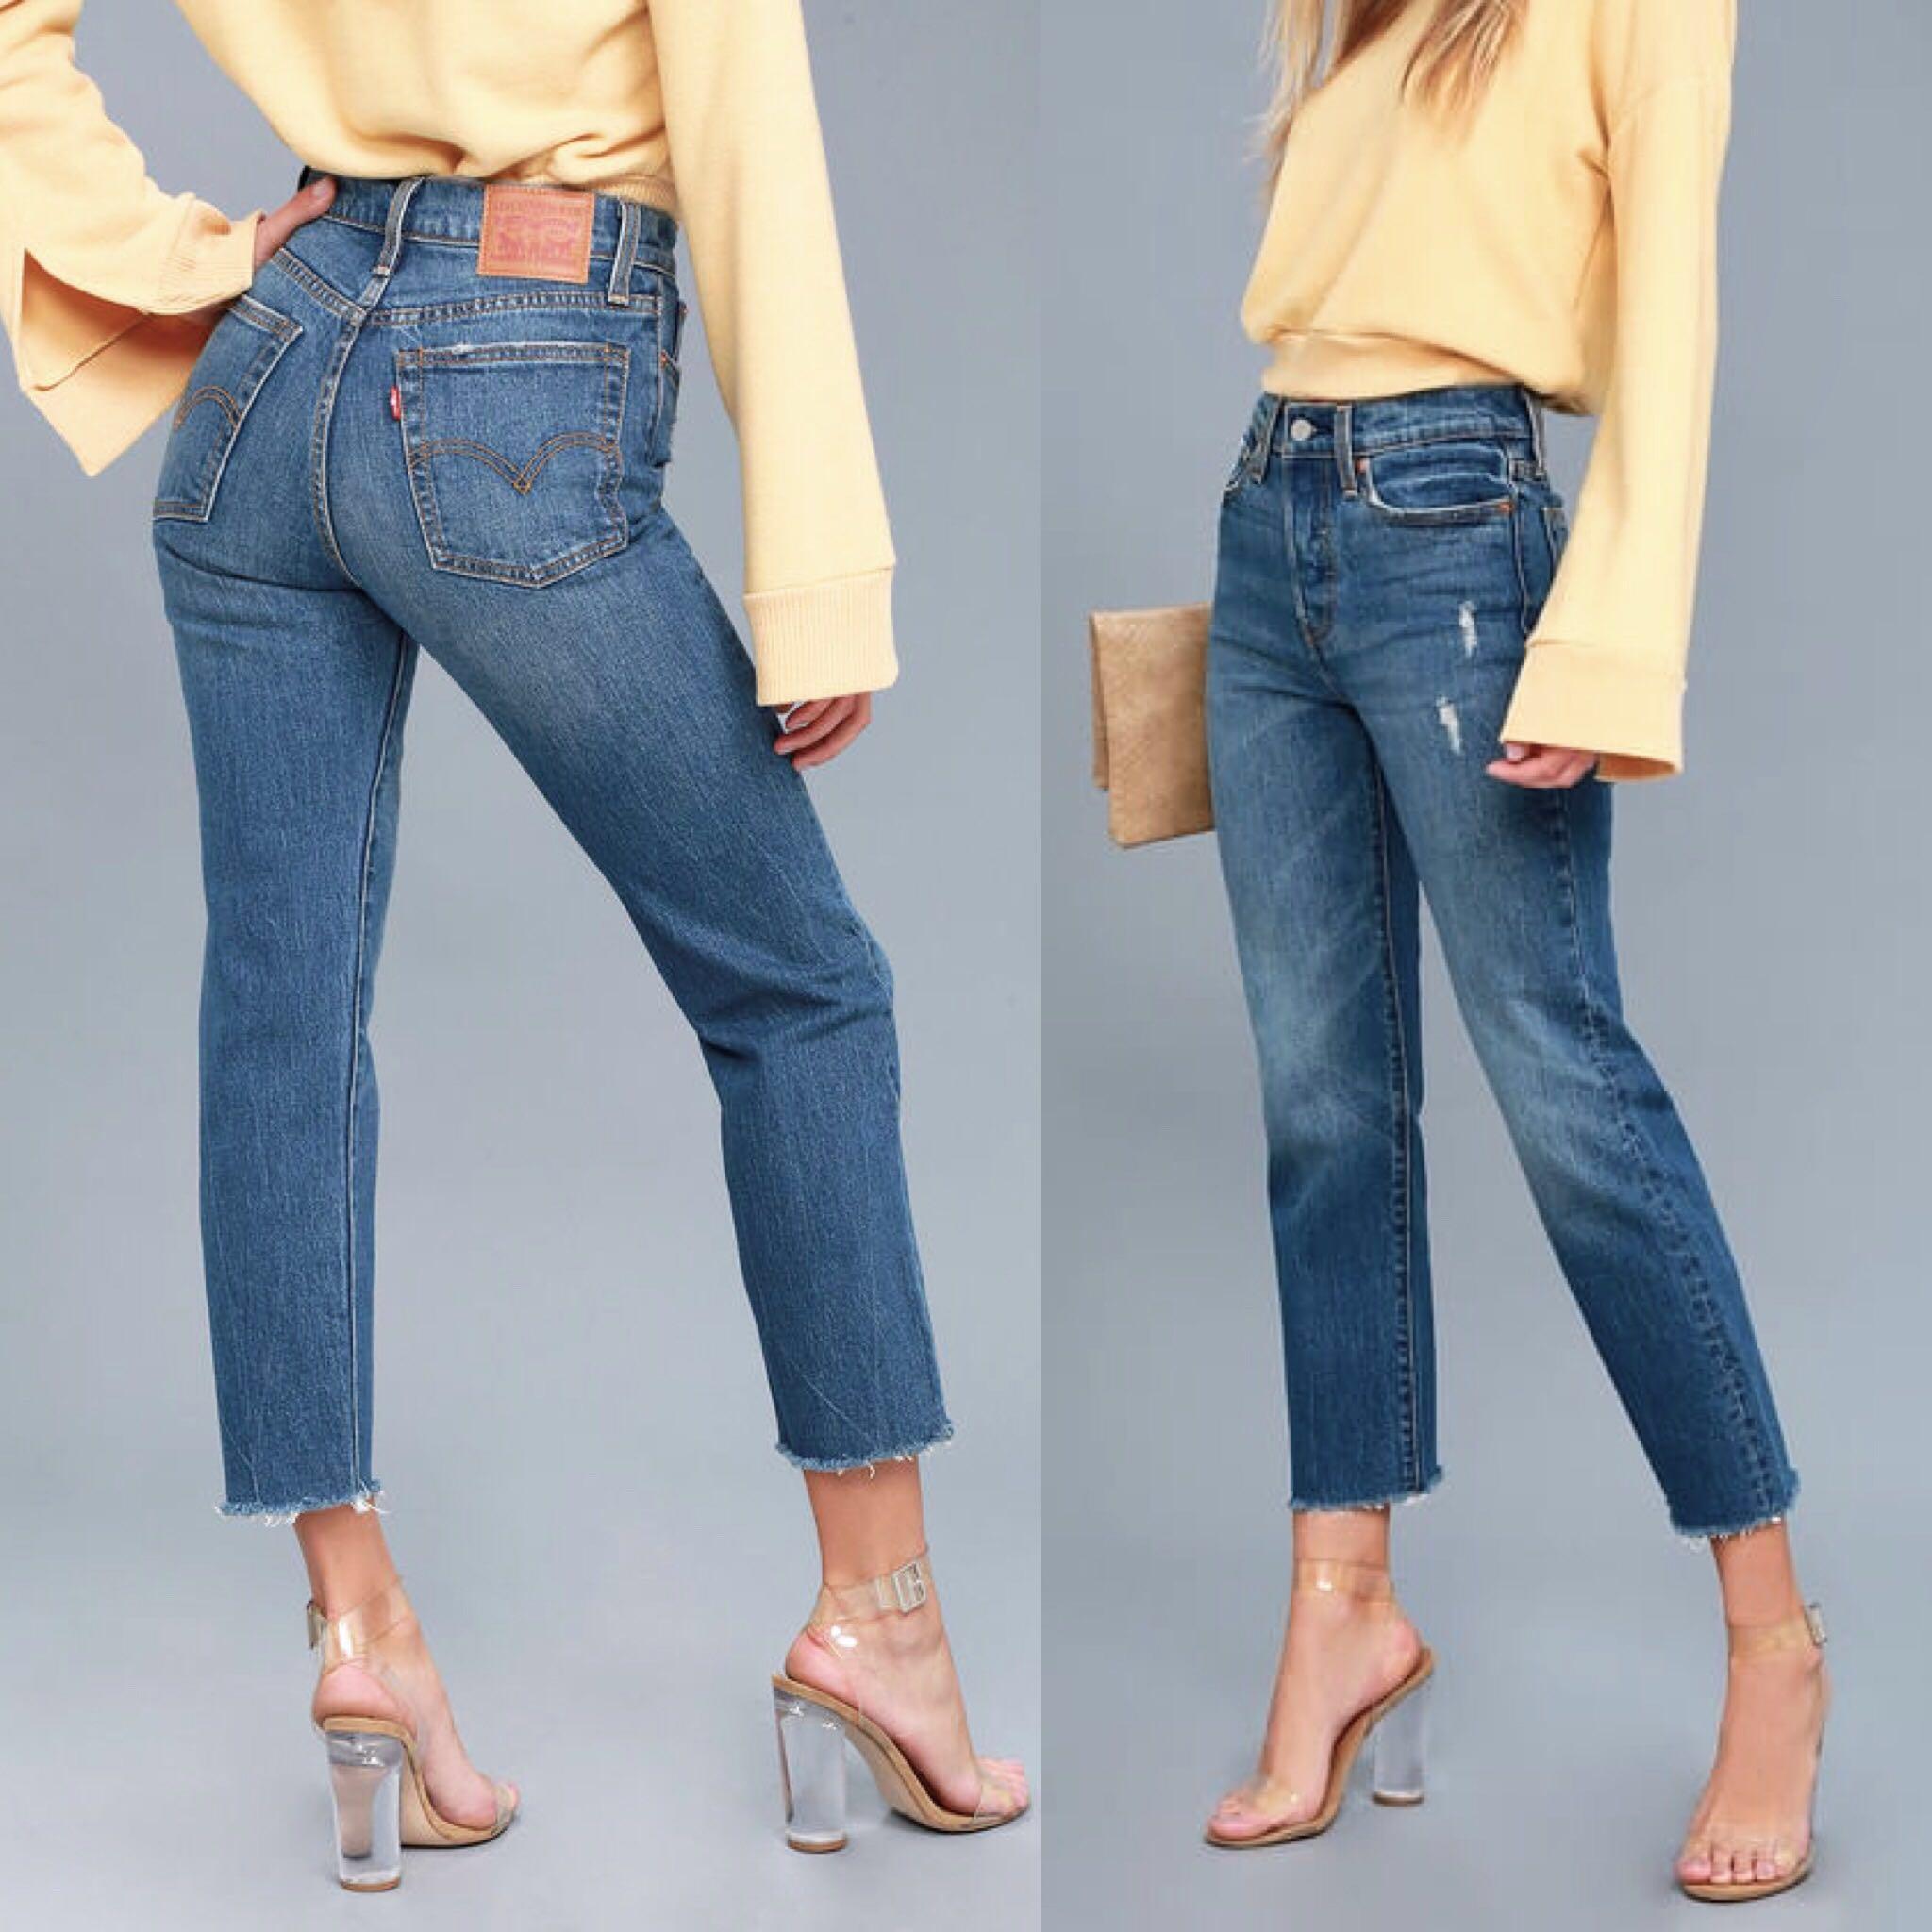 4a9cbea0b971ed Levi's Highwaist Straight Leg Wedgie Denim Jeans, Women's Fashion ...